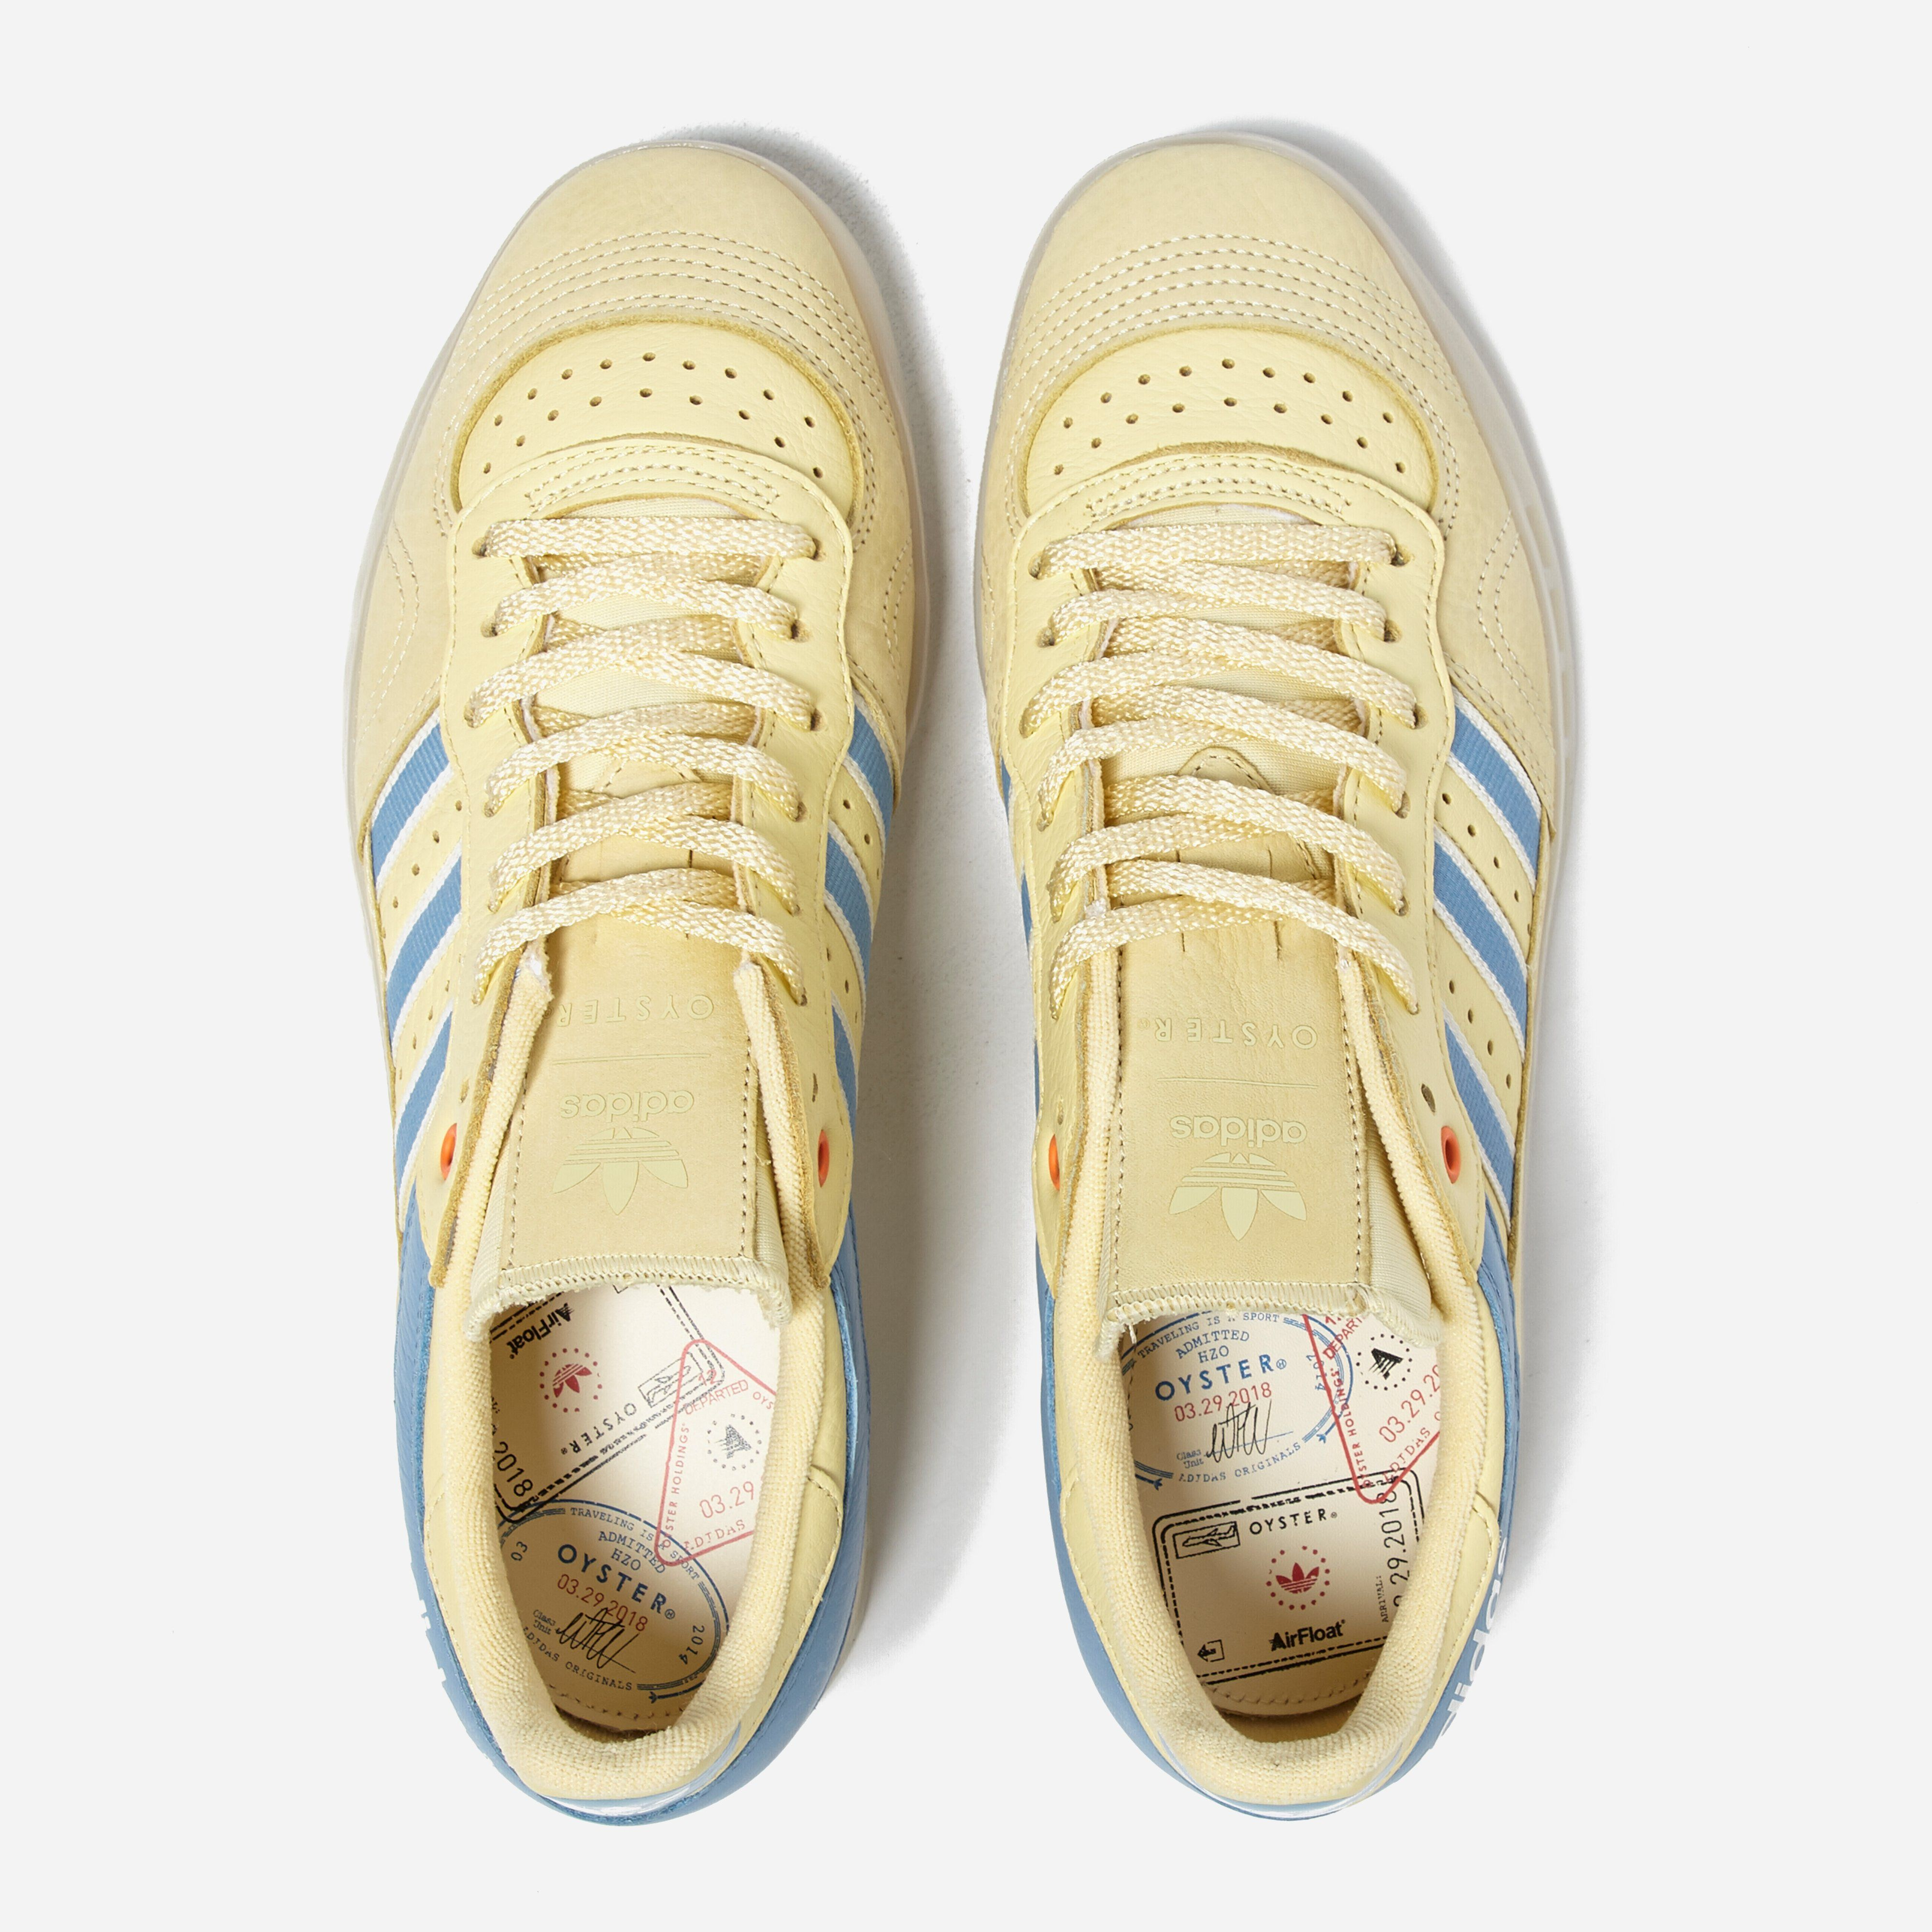 adidas Originals x Oyster Holdings Handball Top